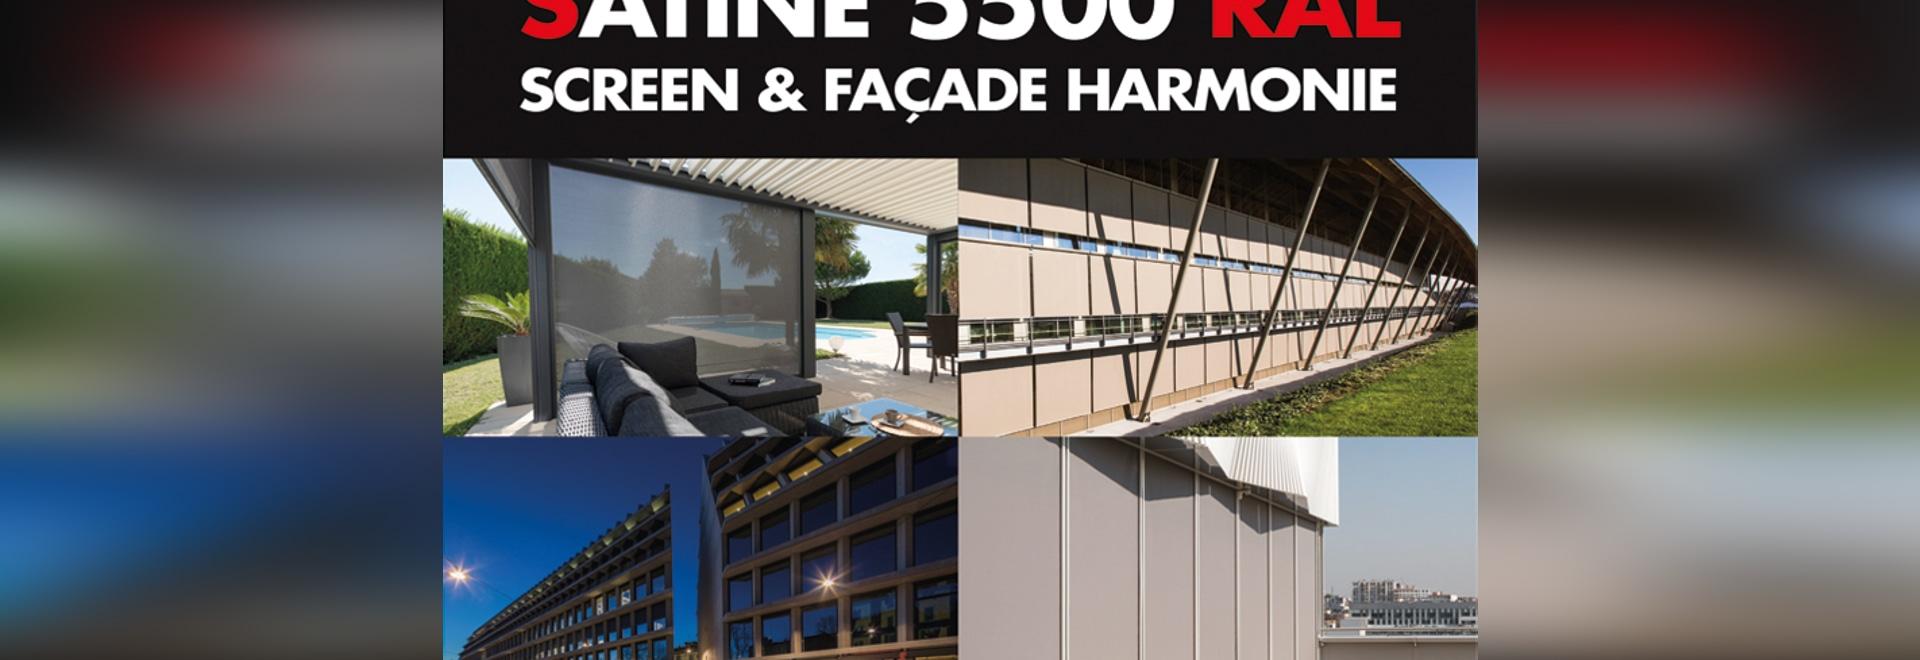 New brochure: Satiné 5500 RAL